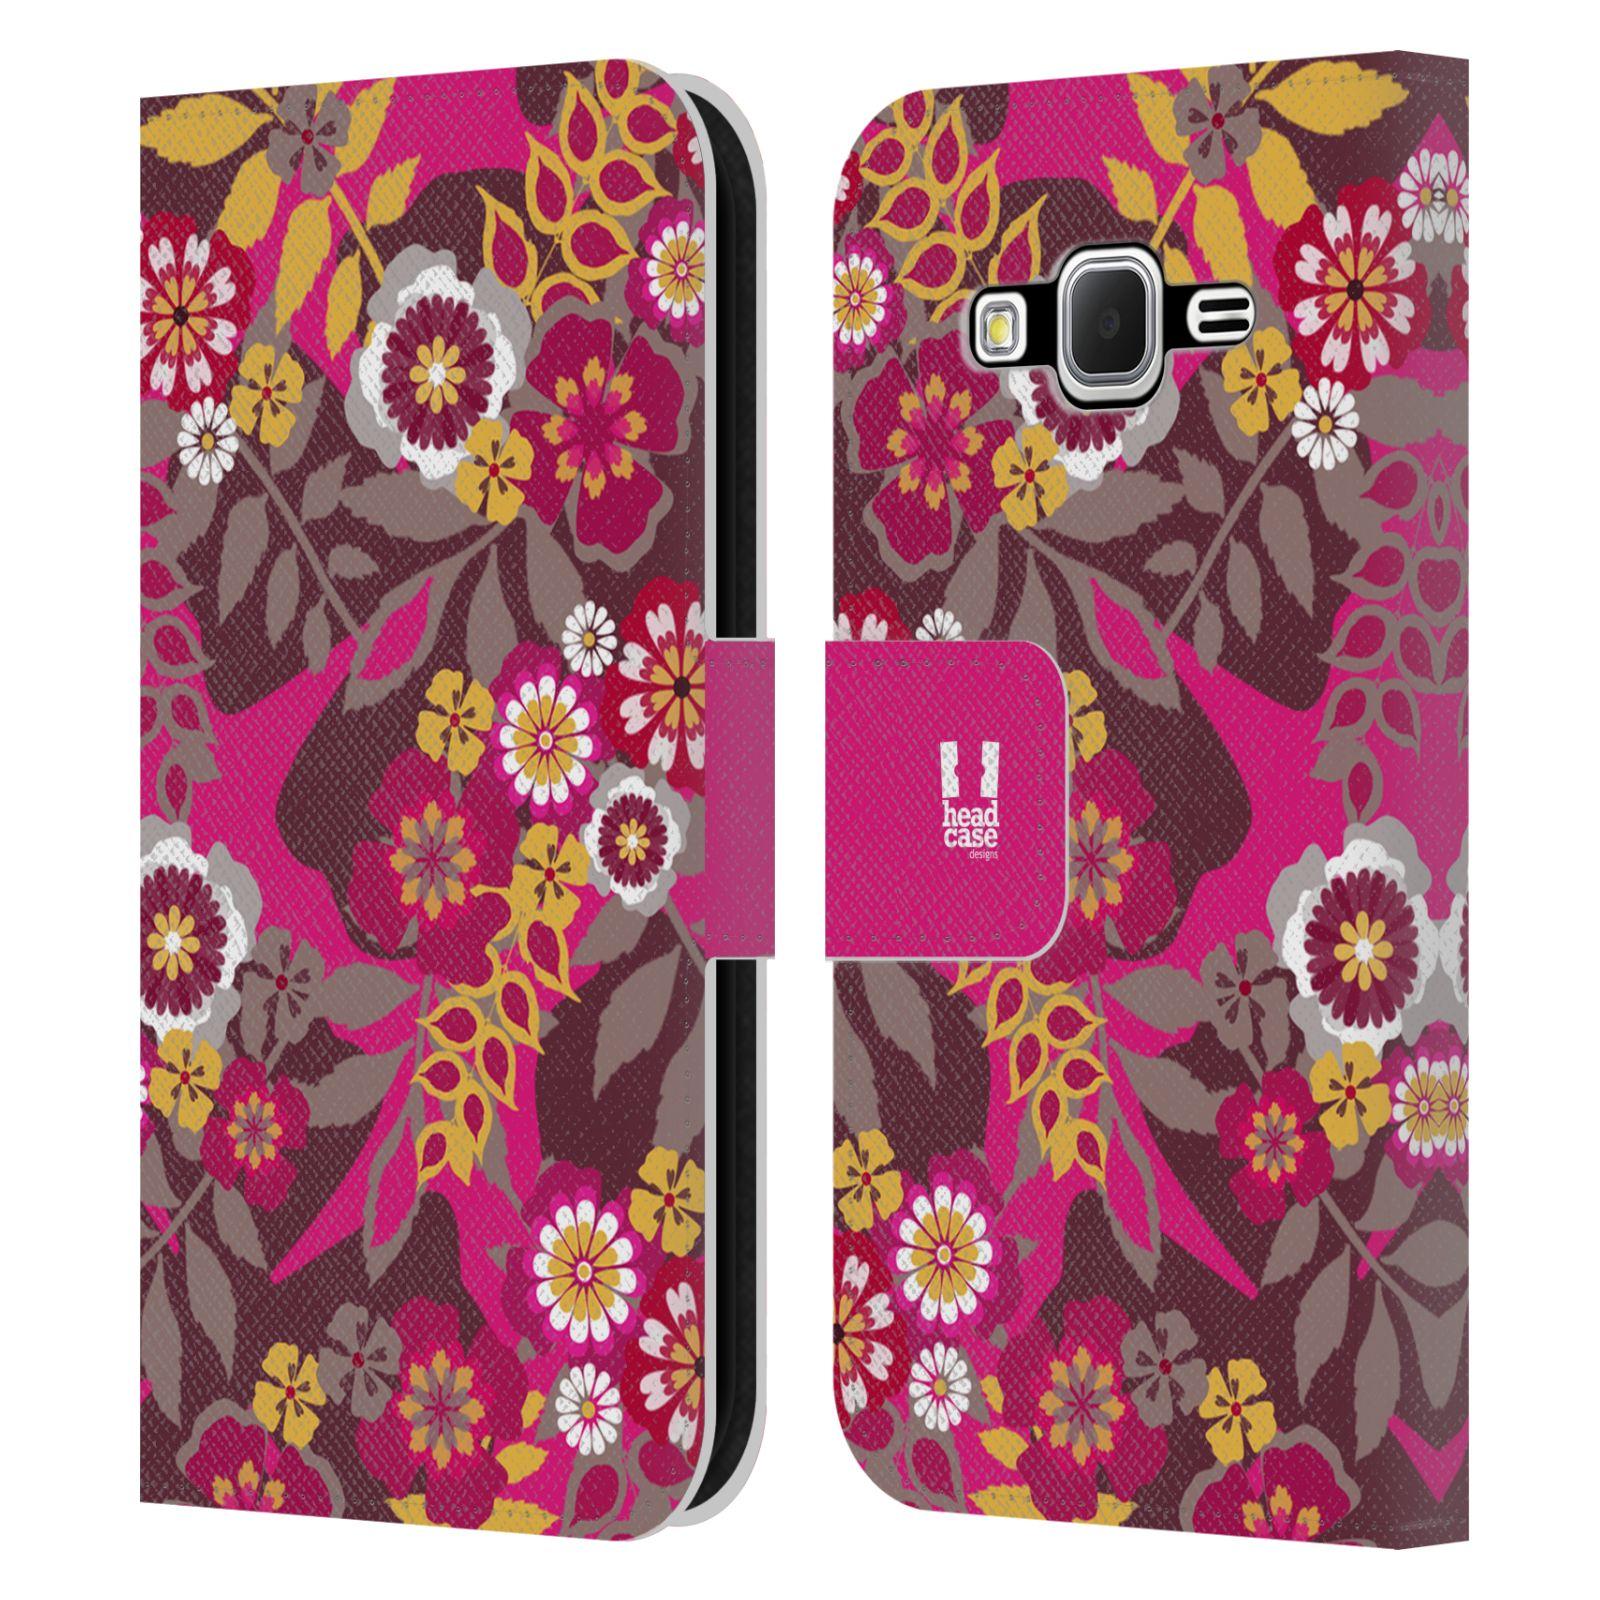 HEAD CASE Flipové pouzdro pro mobil Samsung Galaxy CORE PRIME BOTANIKA růžová a hnědá